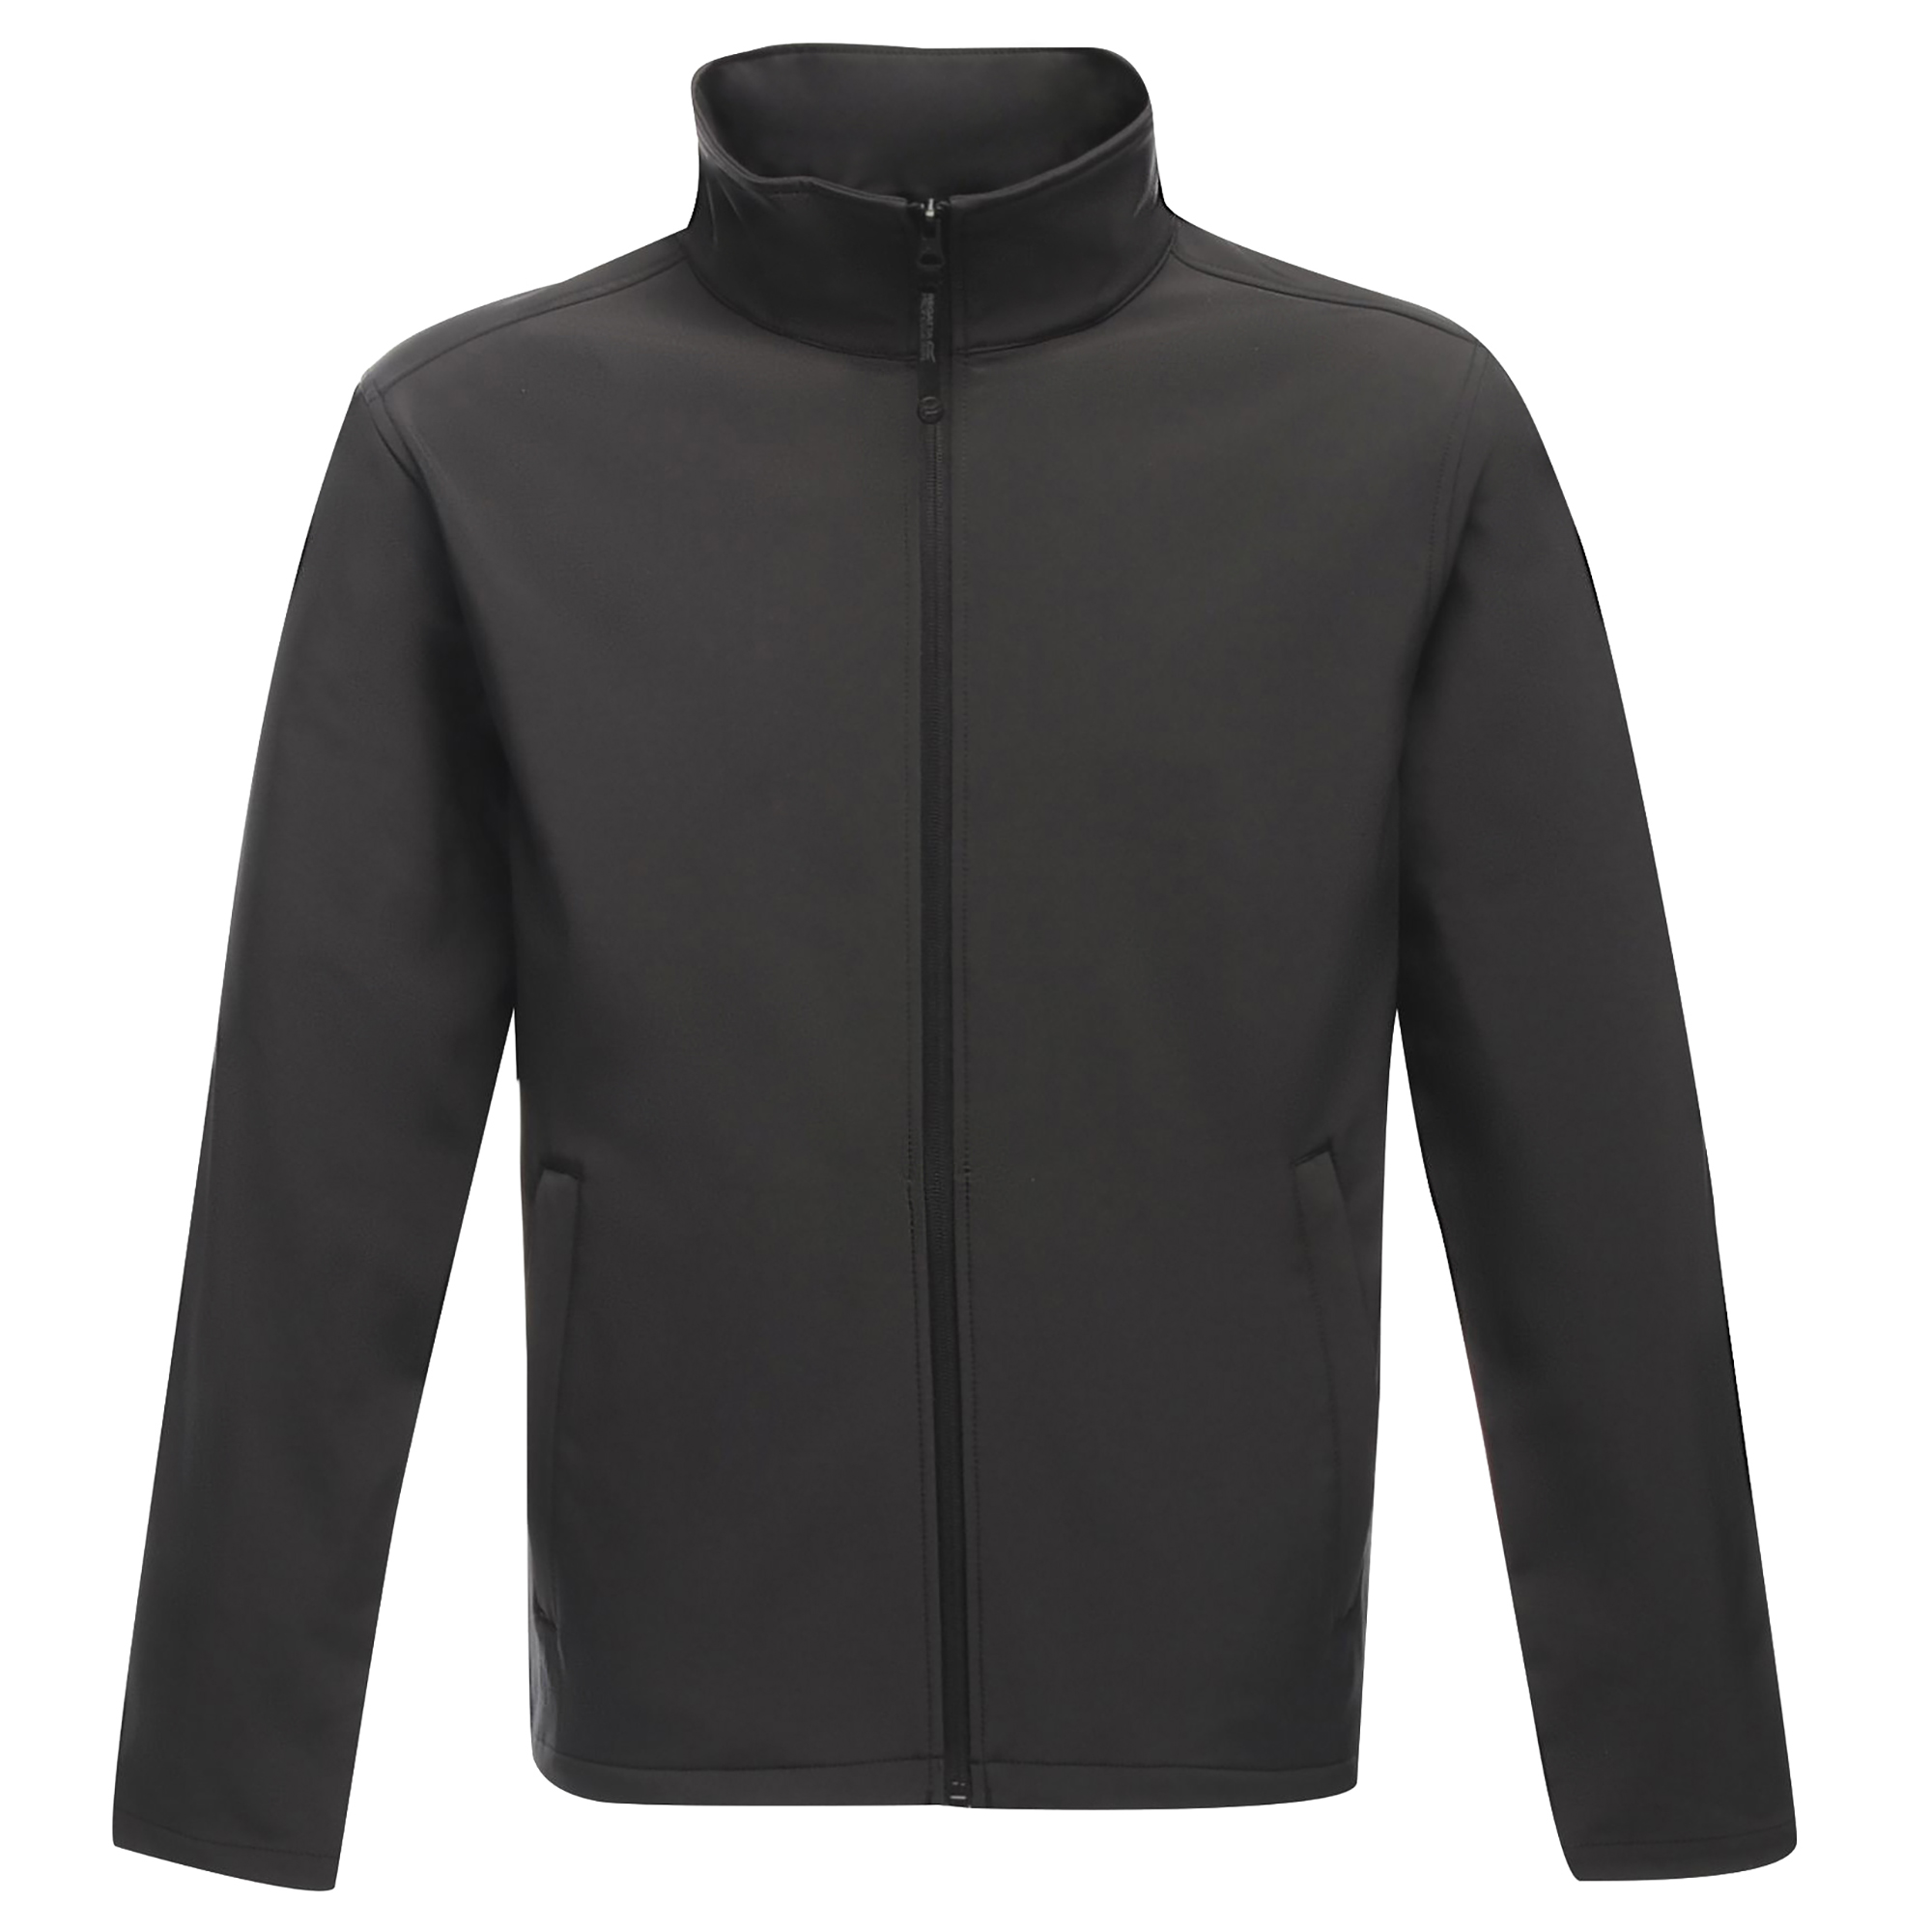 Mens regatta jacket - Regatta Classic Mens Water Repellent Softshell Jacket